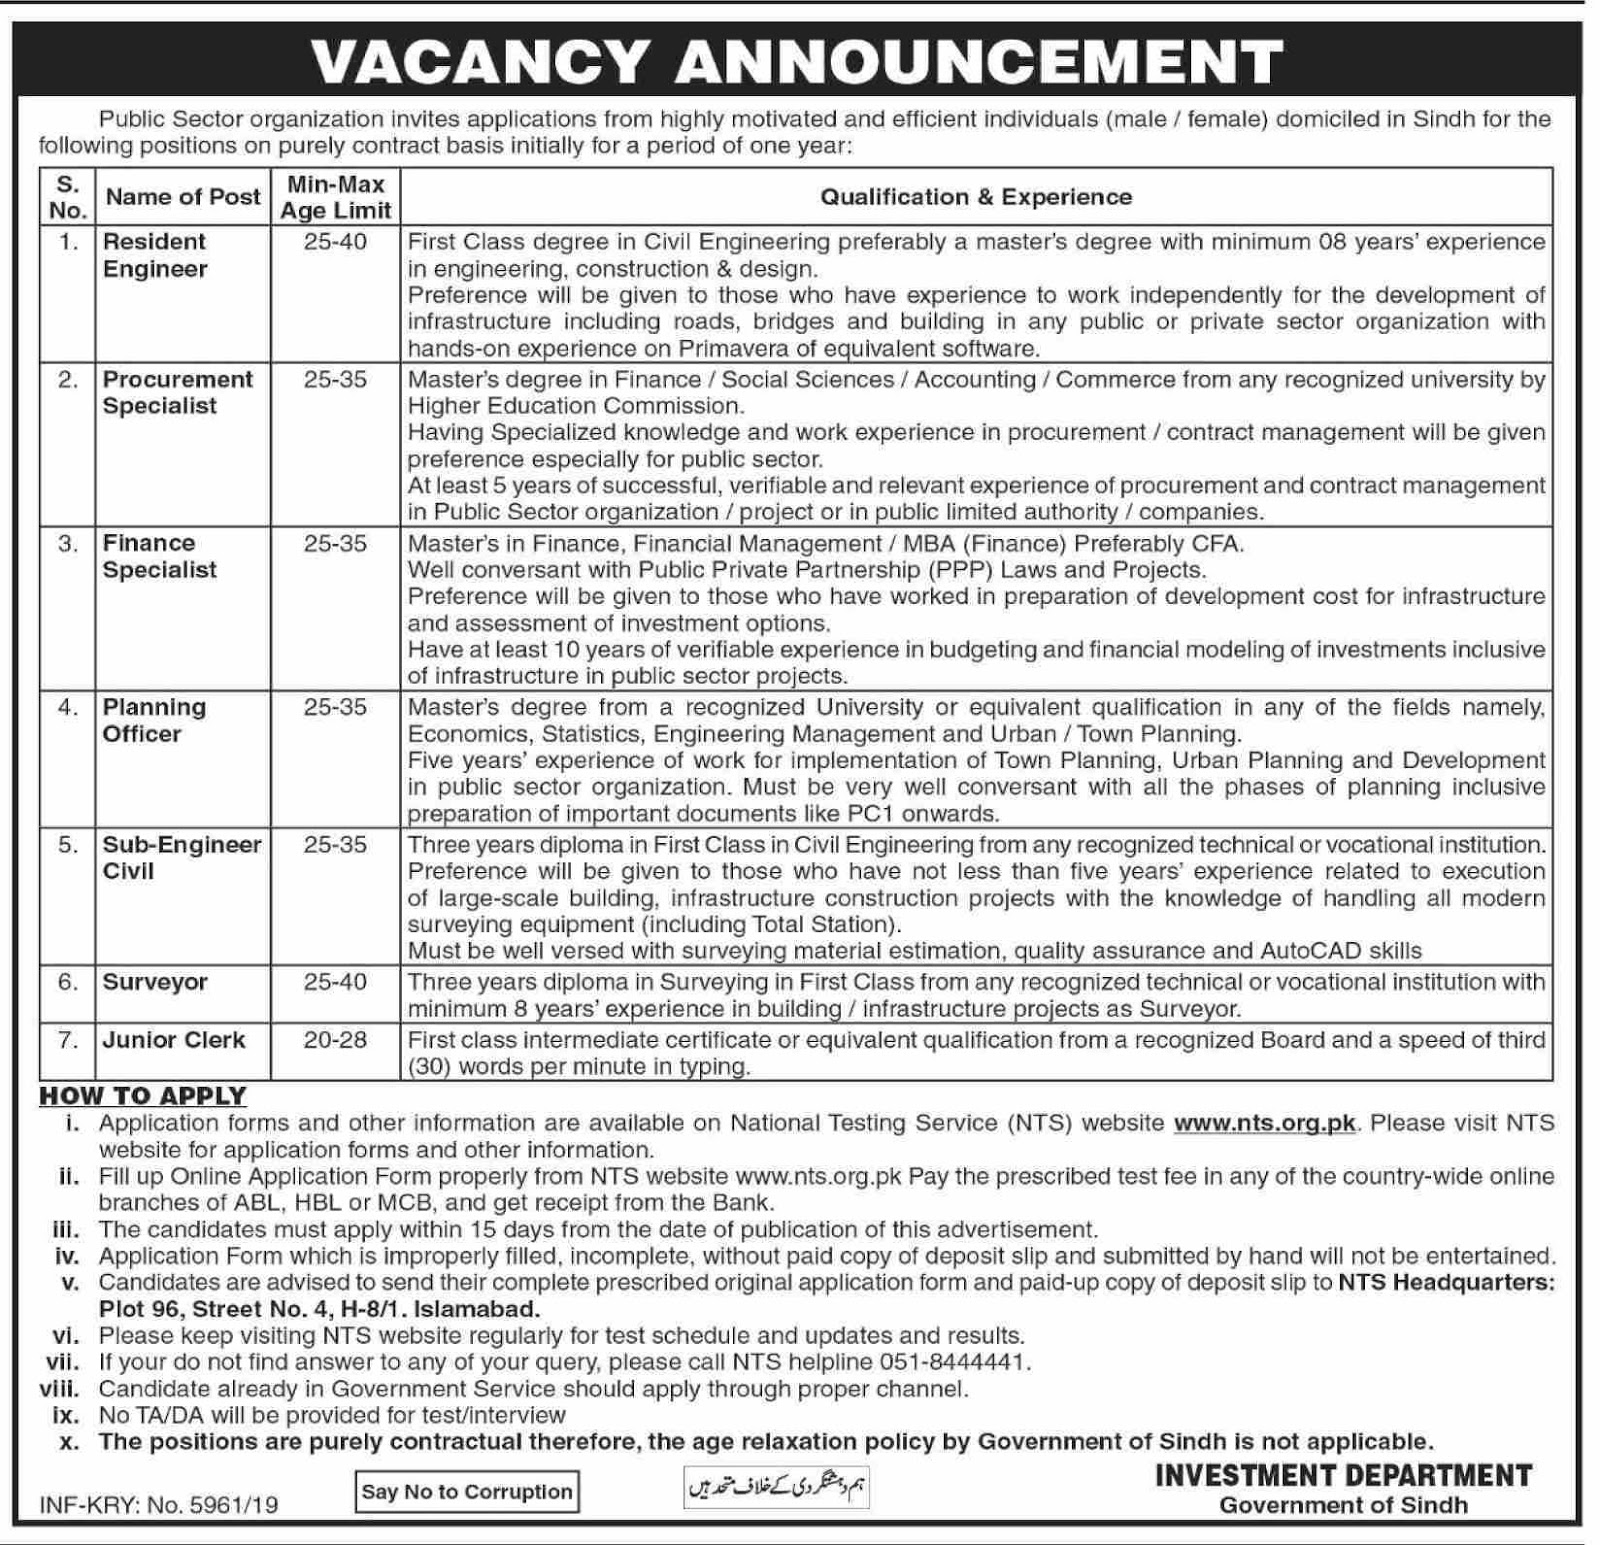 Public Sector Organization Jobs for Male/Female